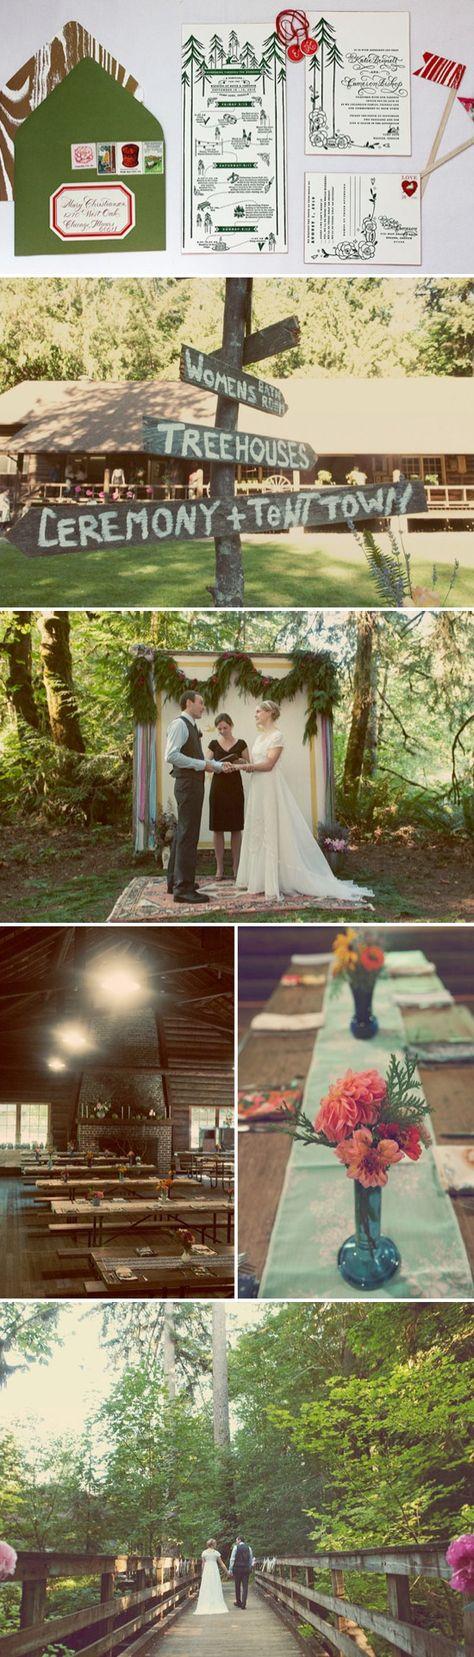 Camp Themed Weddings